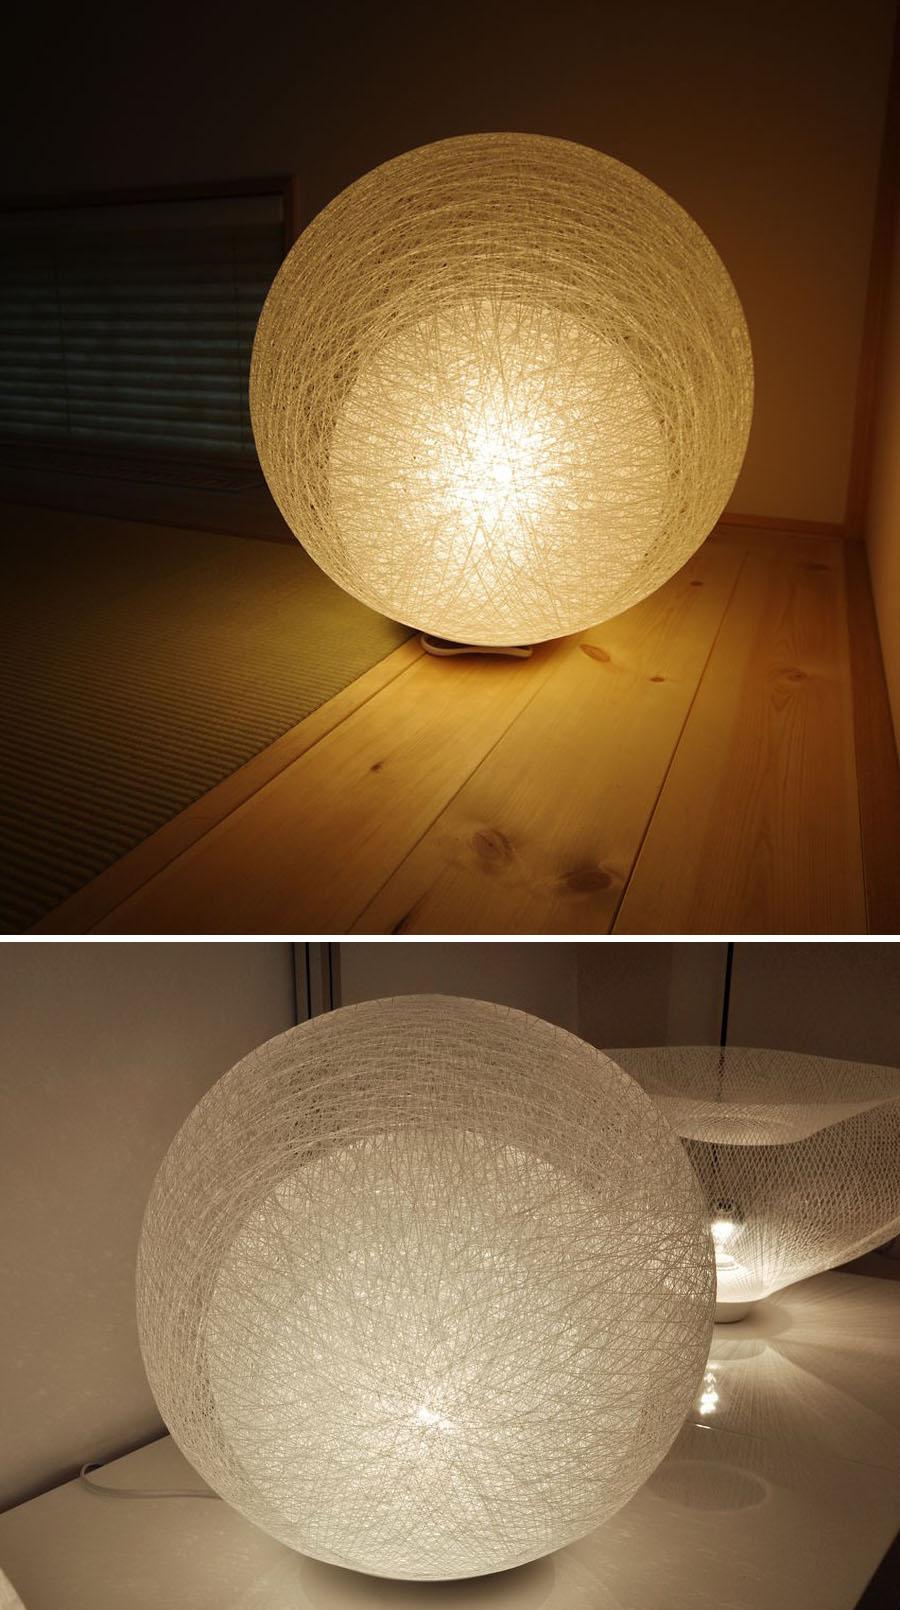 Yamagiwa Mayuhana Tri Globe Table Lamp Click To View Additional Images